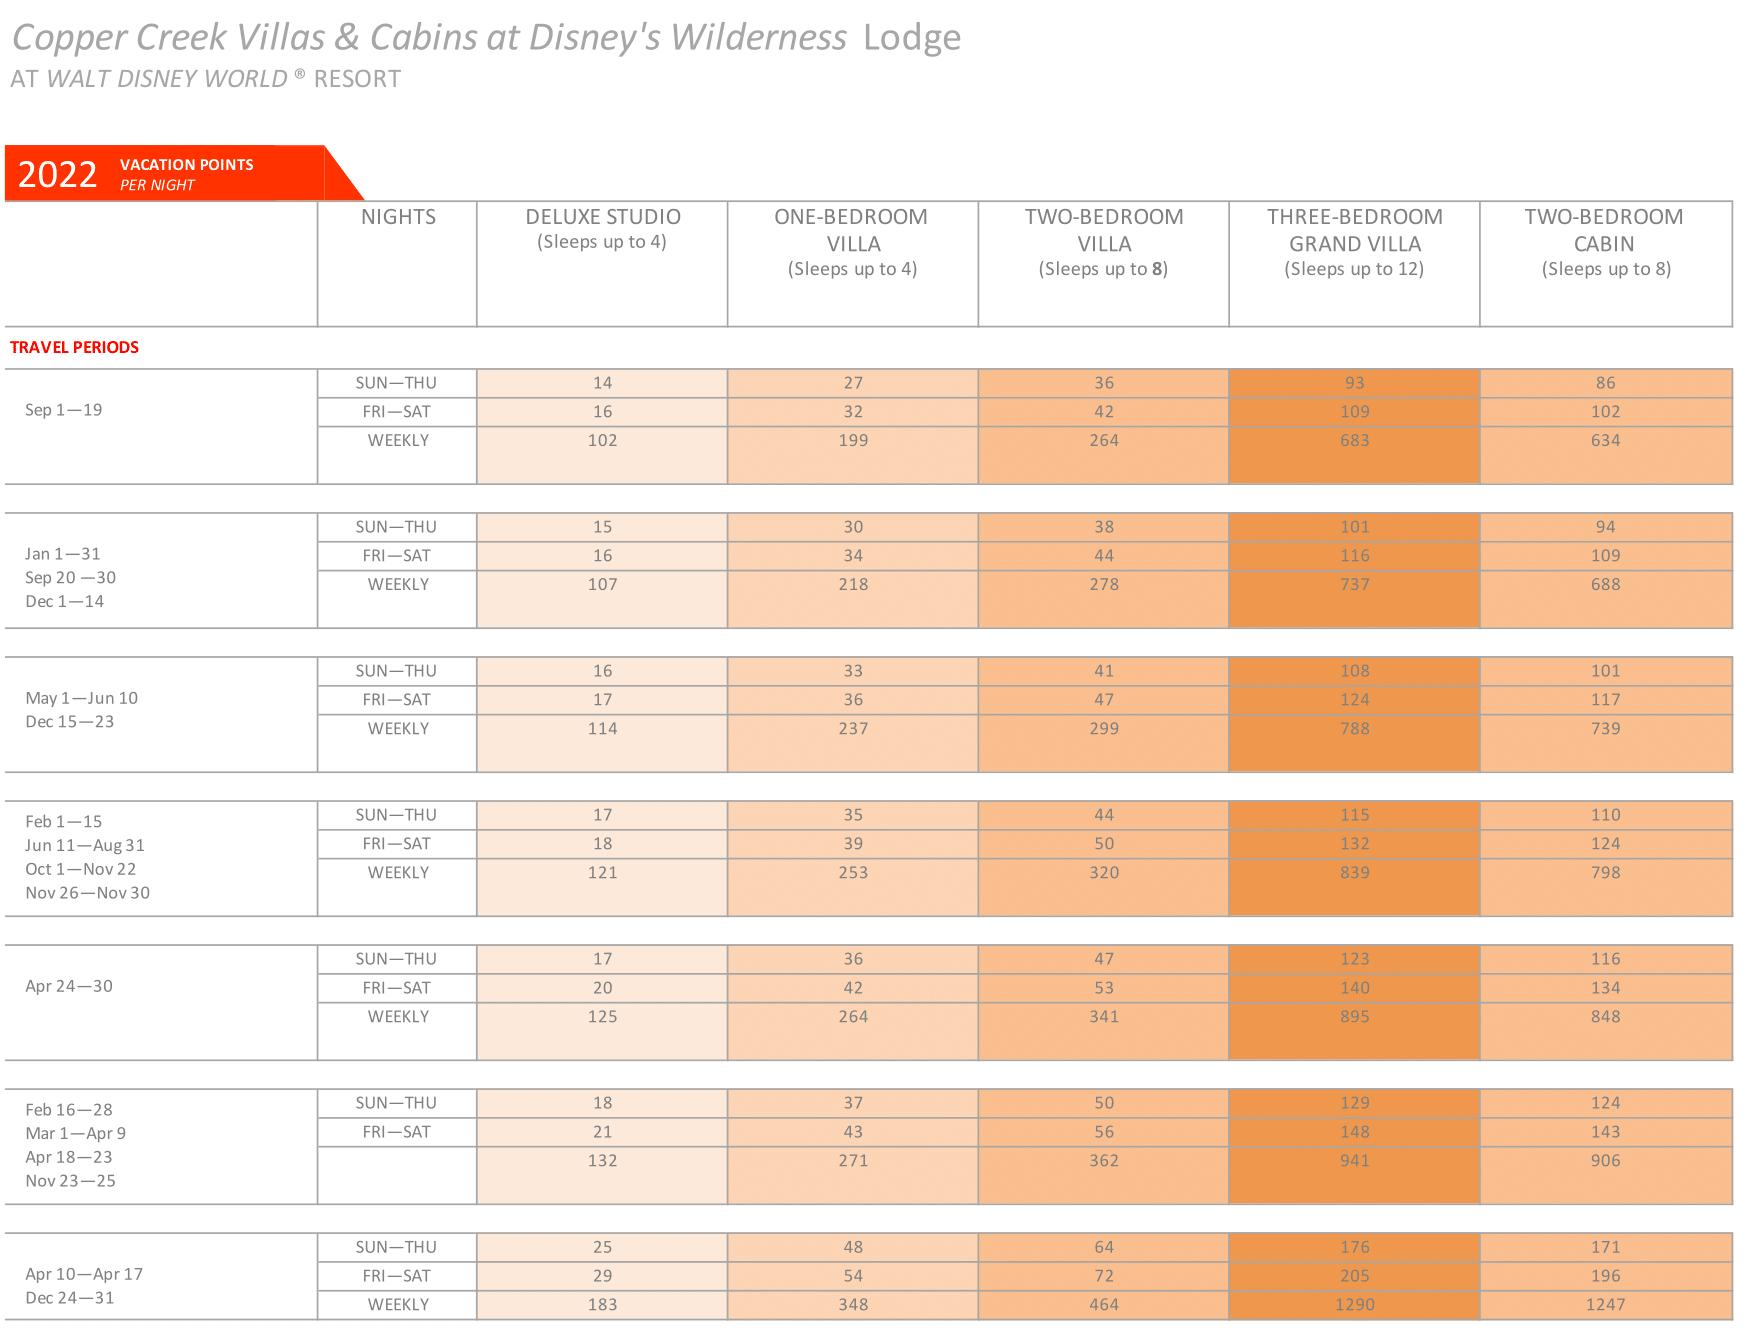 Copper Creek Point Chart 2020